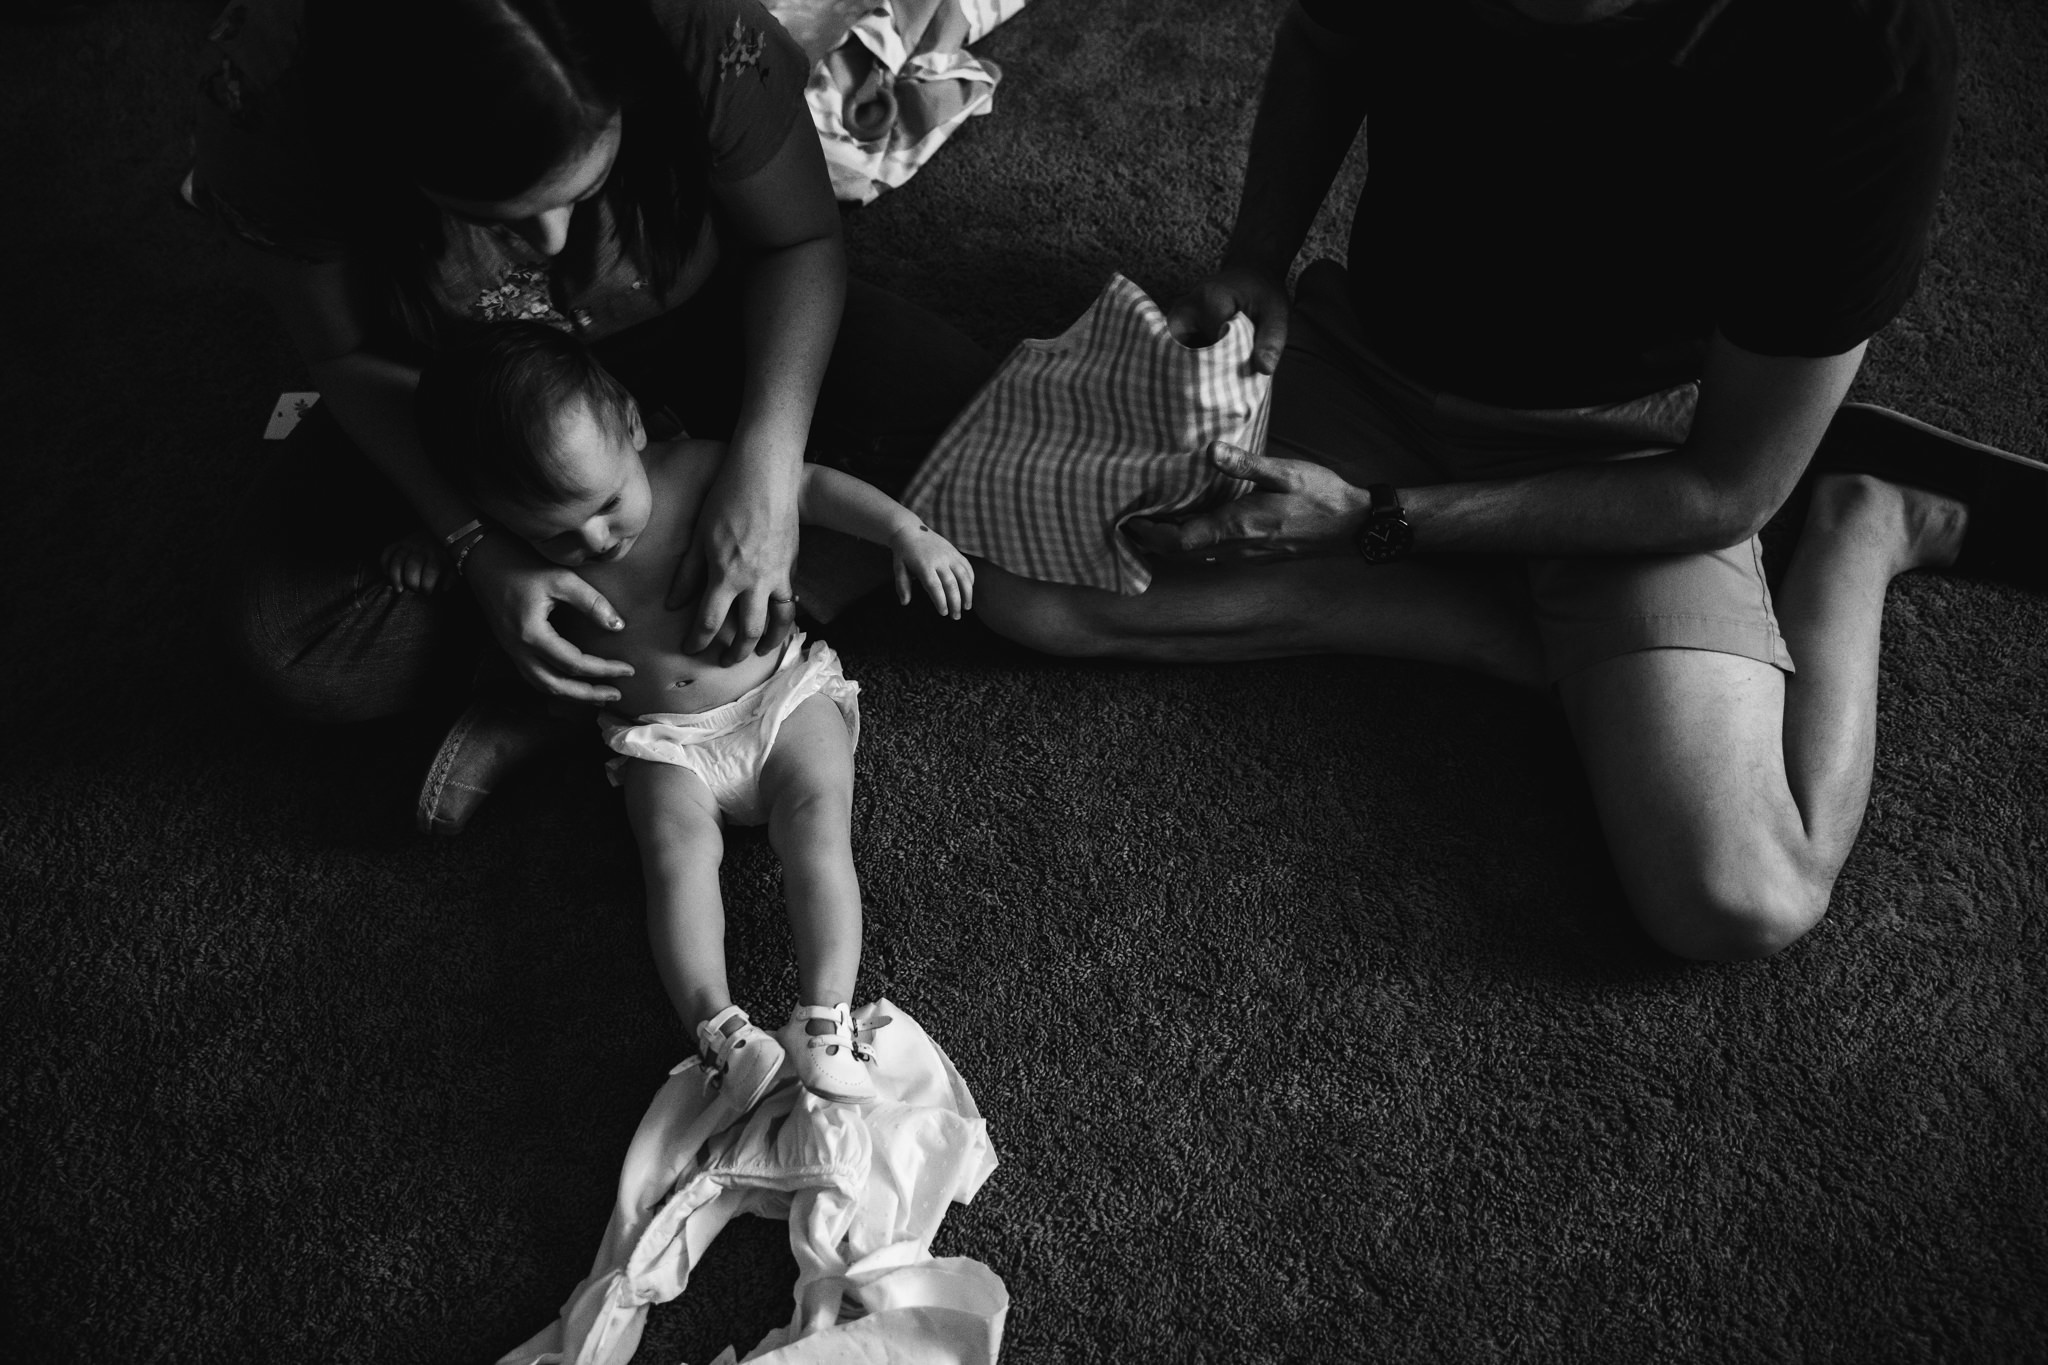 memphis-family-photographer-wiley-family-5.jpg